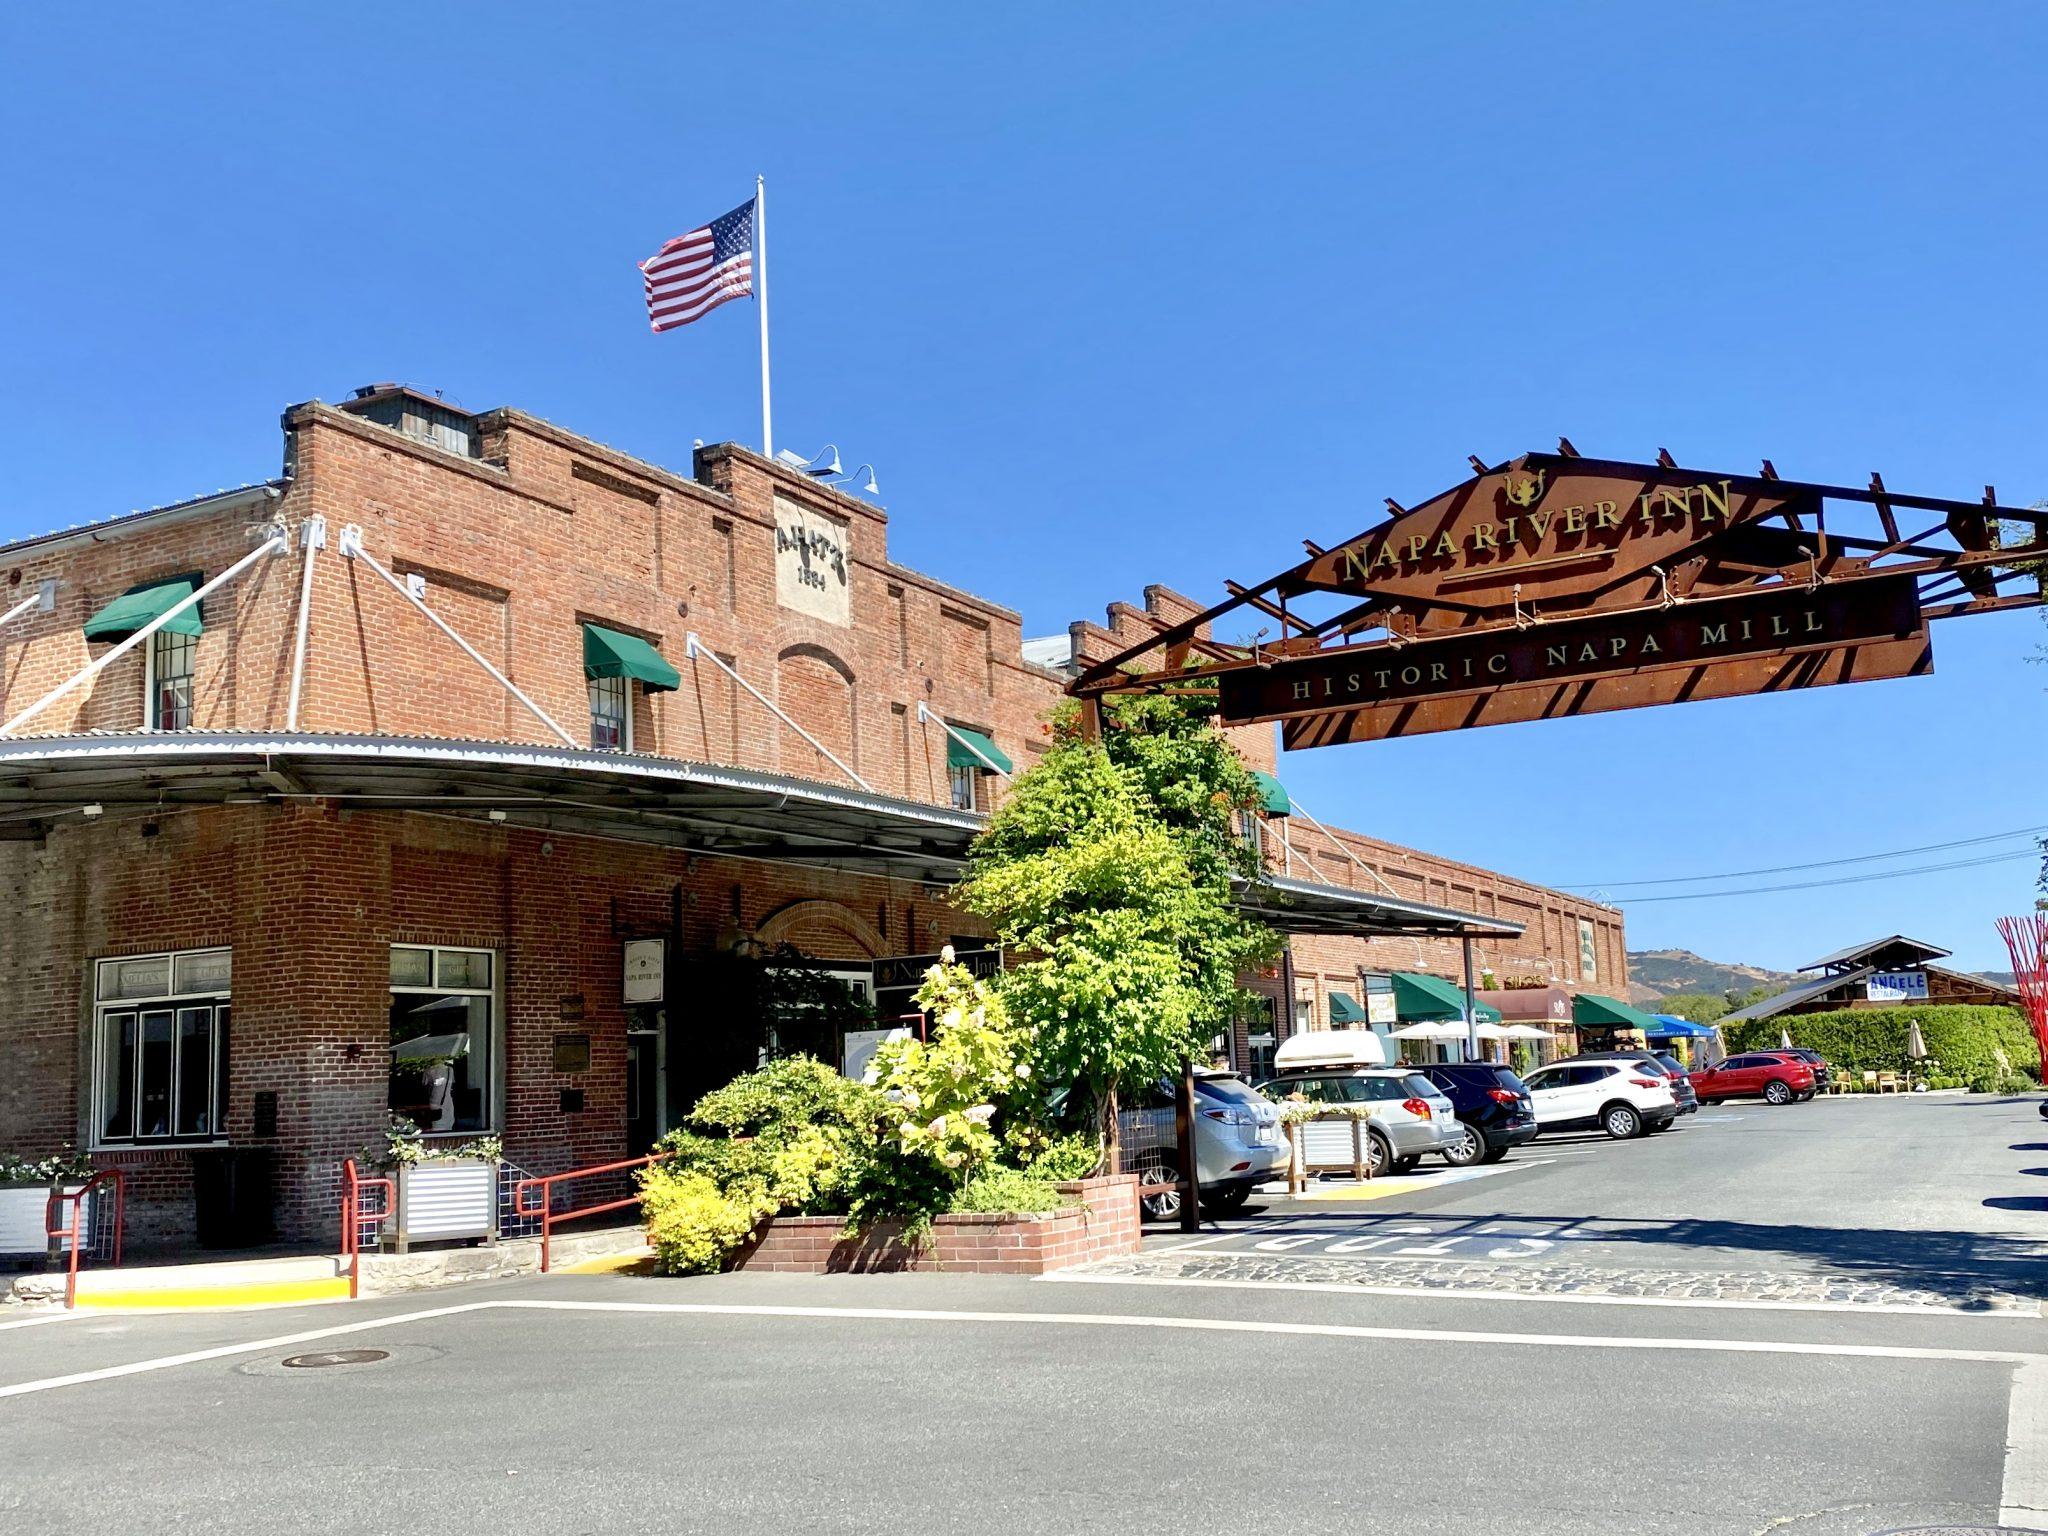 Napa River Inn front entrance and main building